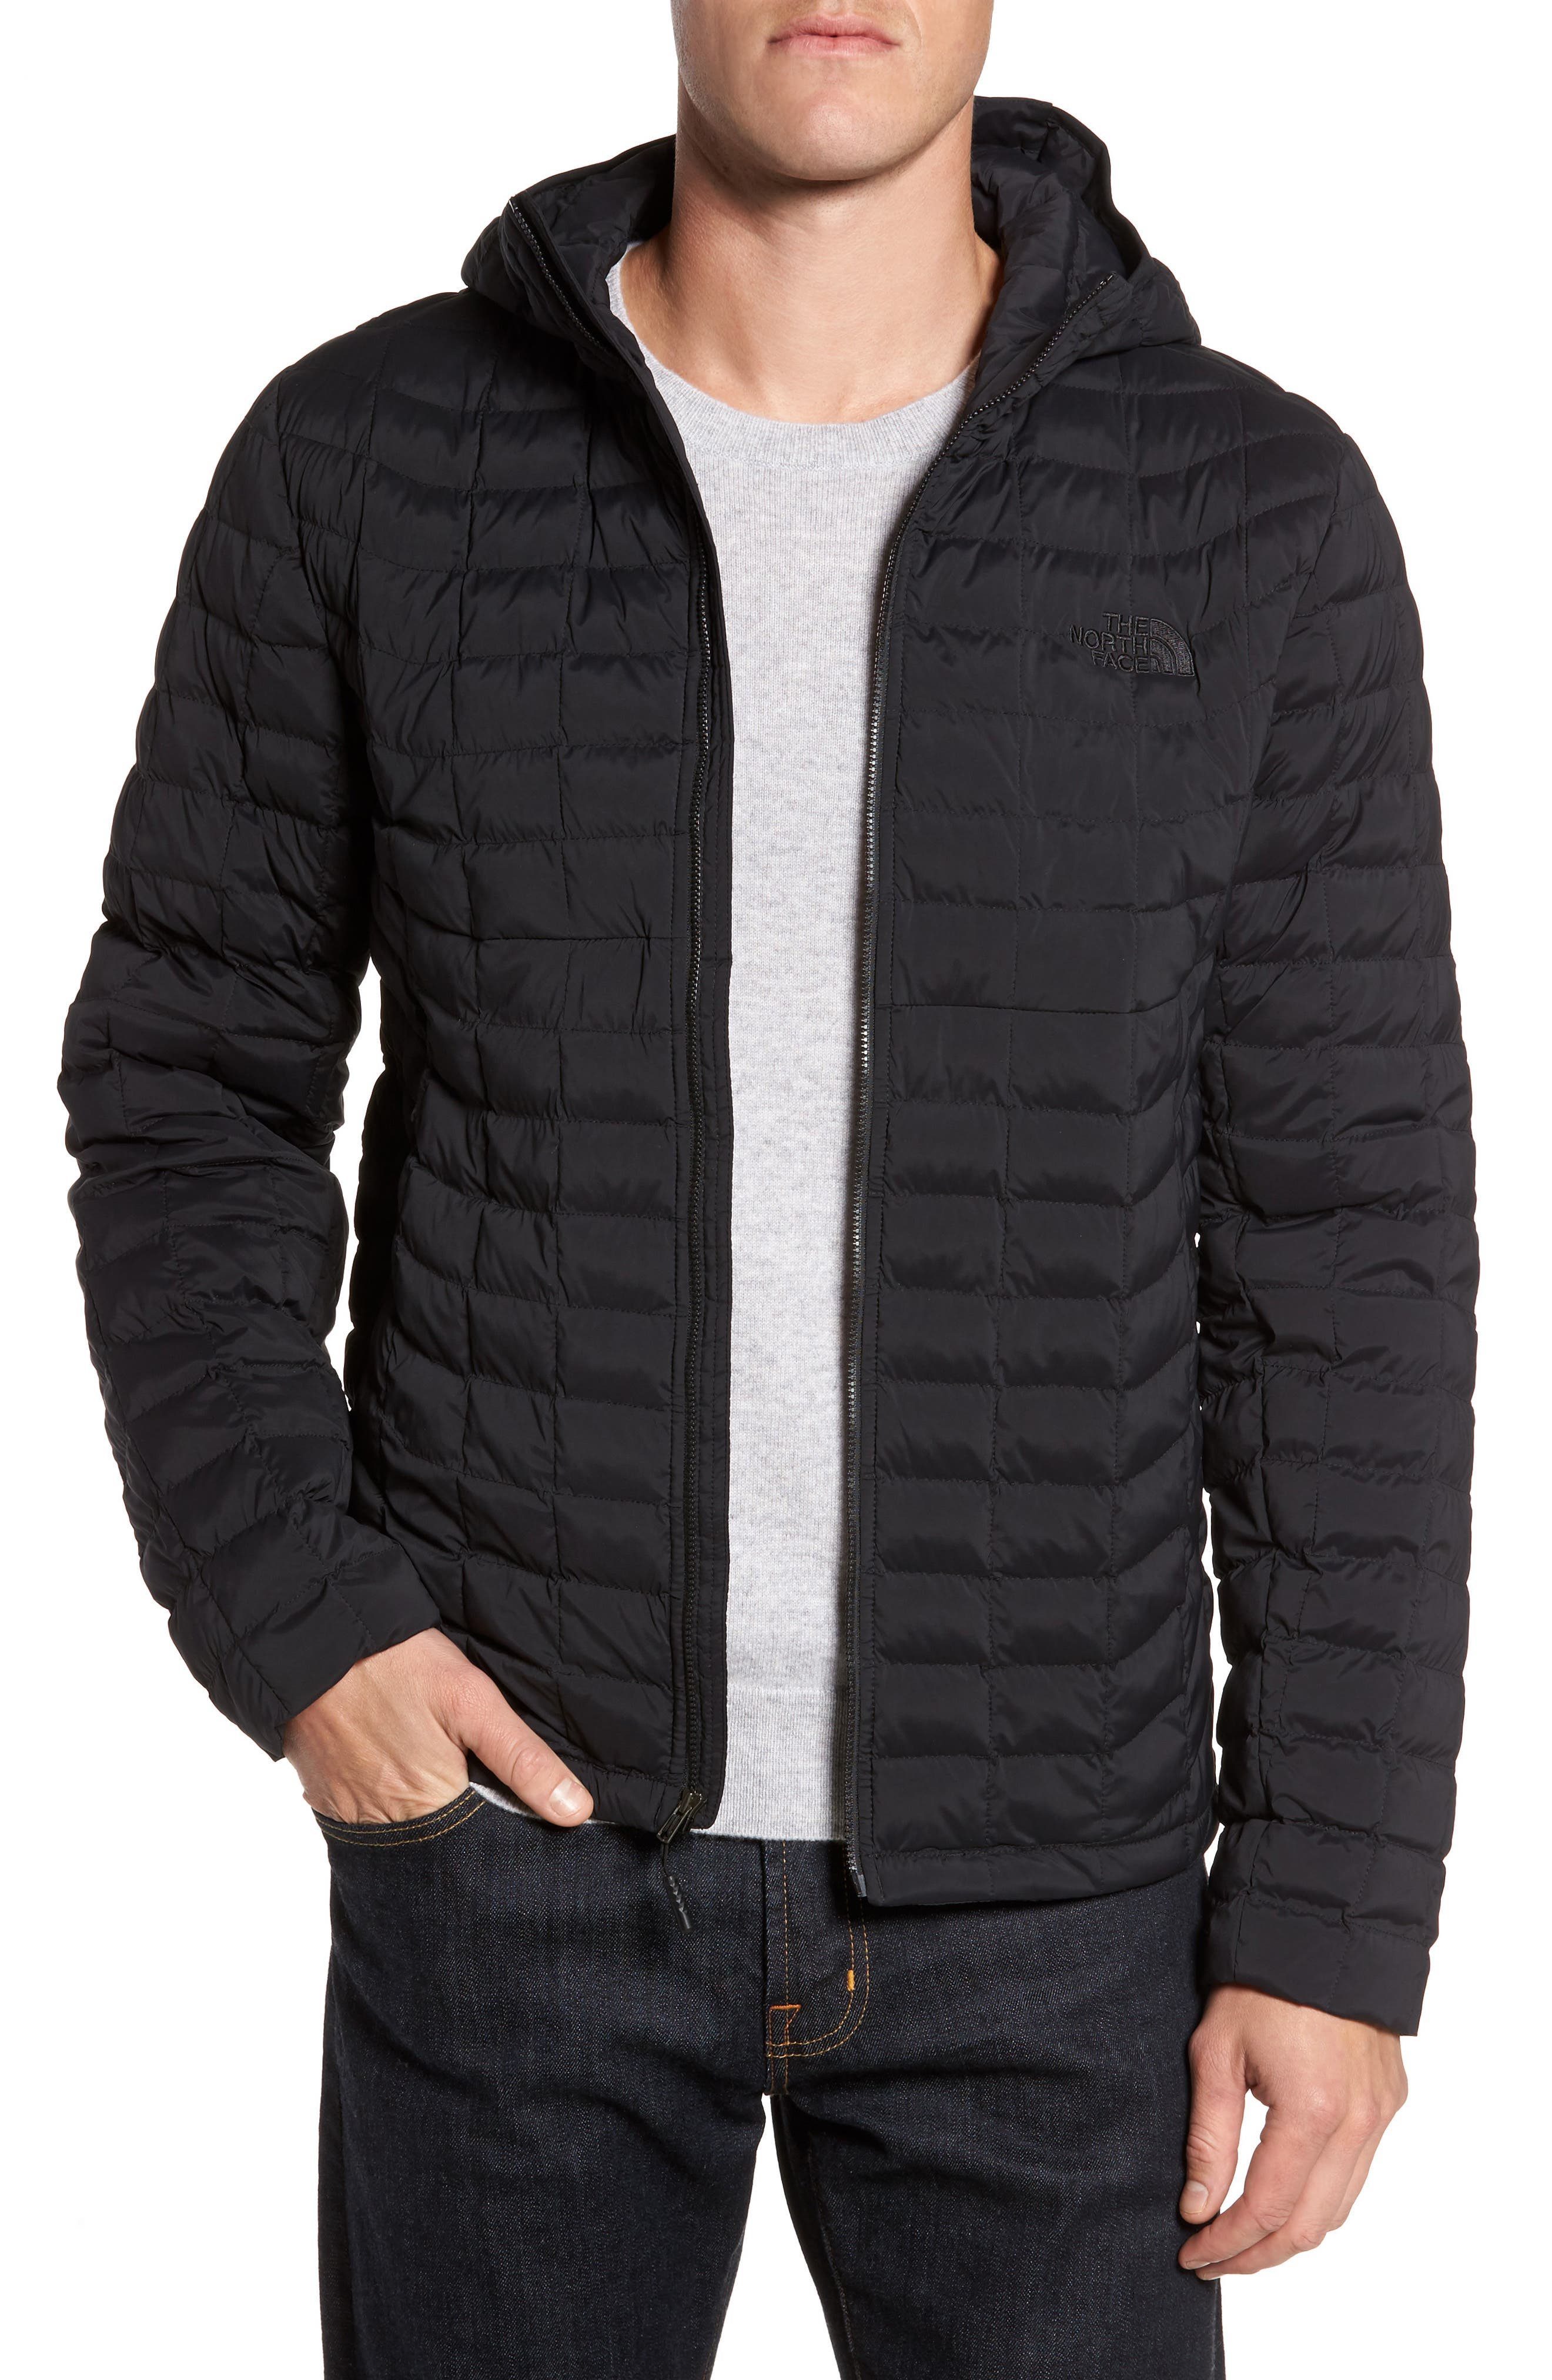 Primaloft jacket the north face